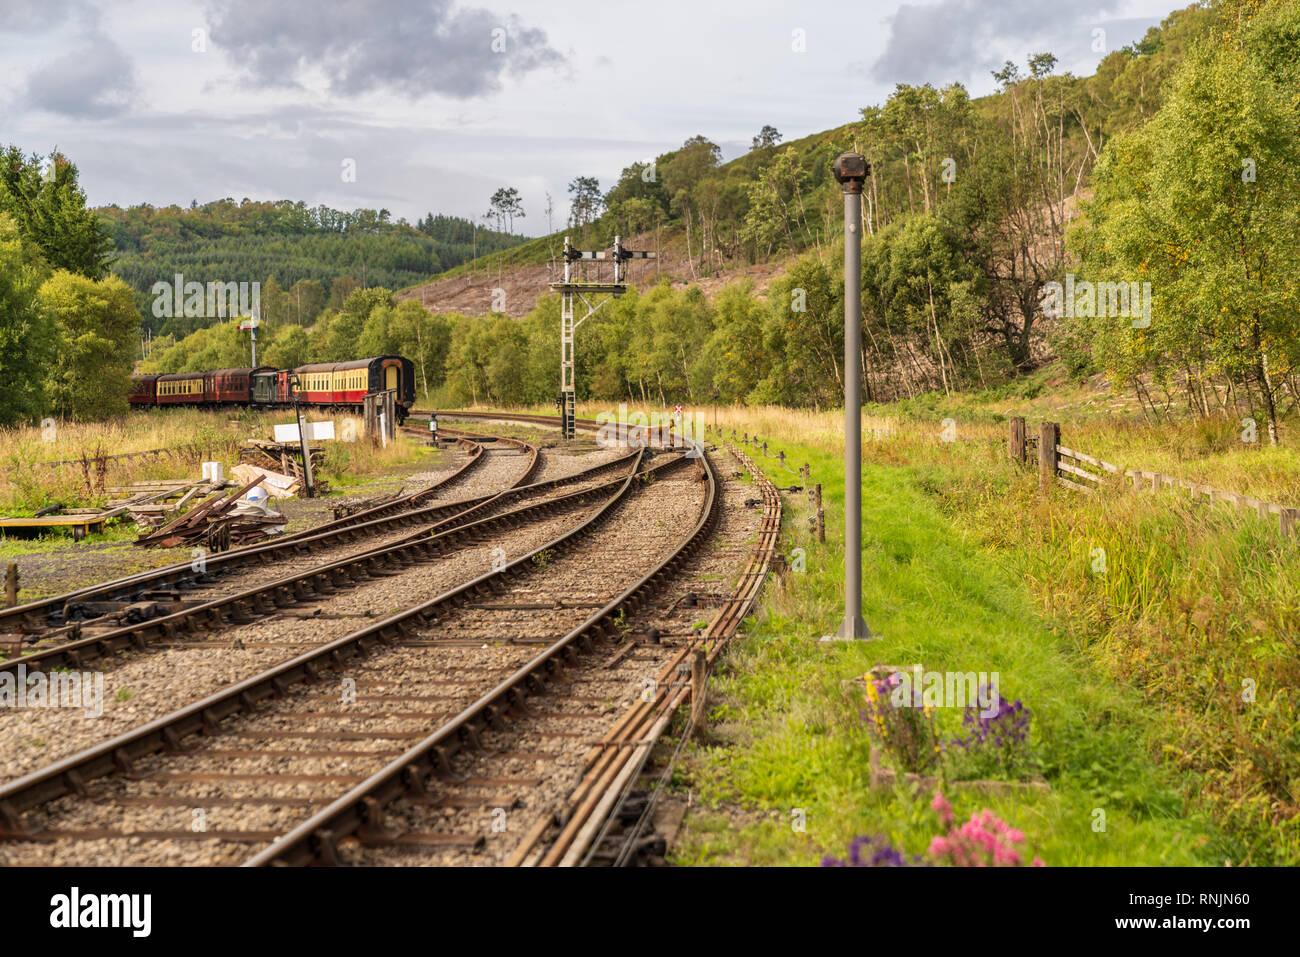 Near Levisham, North Yorkshire, England, UK: September 13, 2018: North Yorkshire Moors Railway waggons near the Levisham Railway station - Stock Image